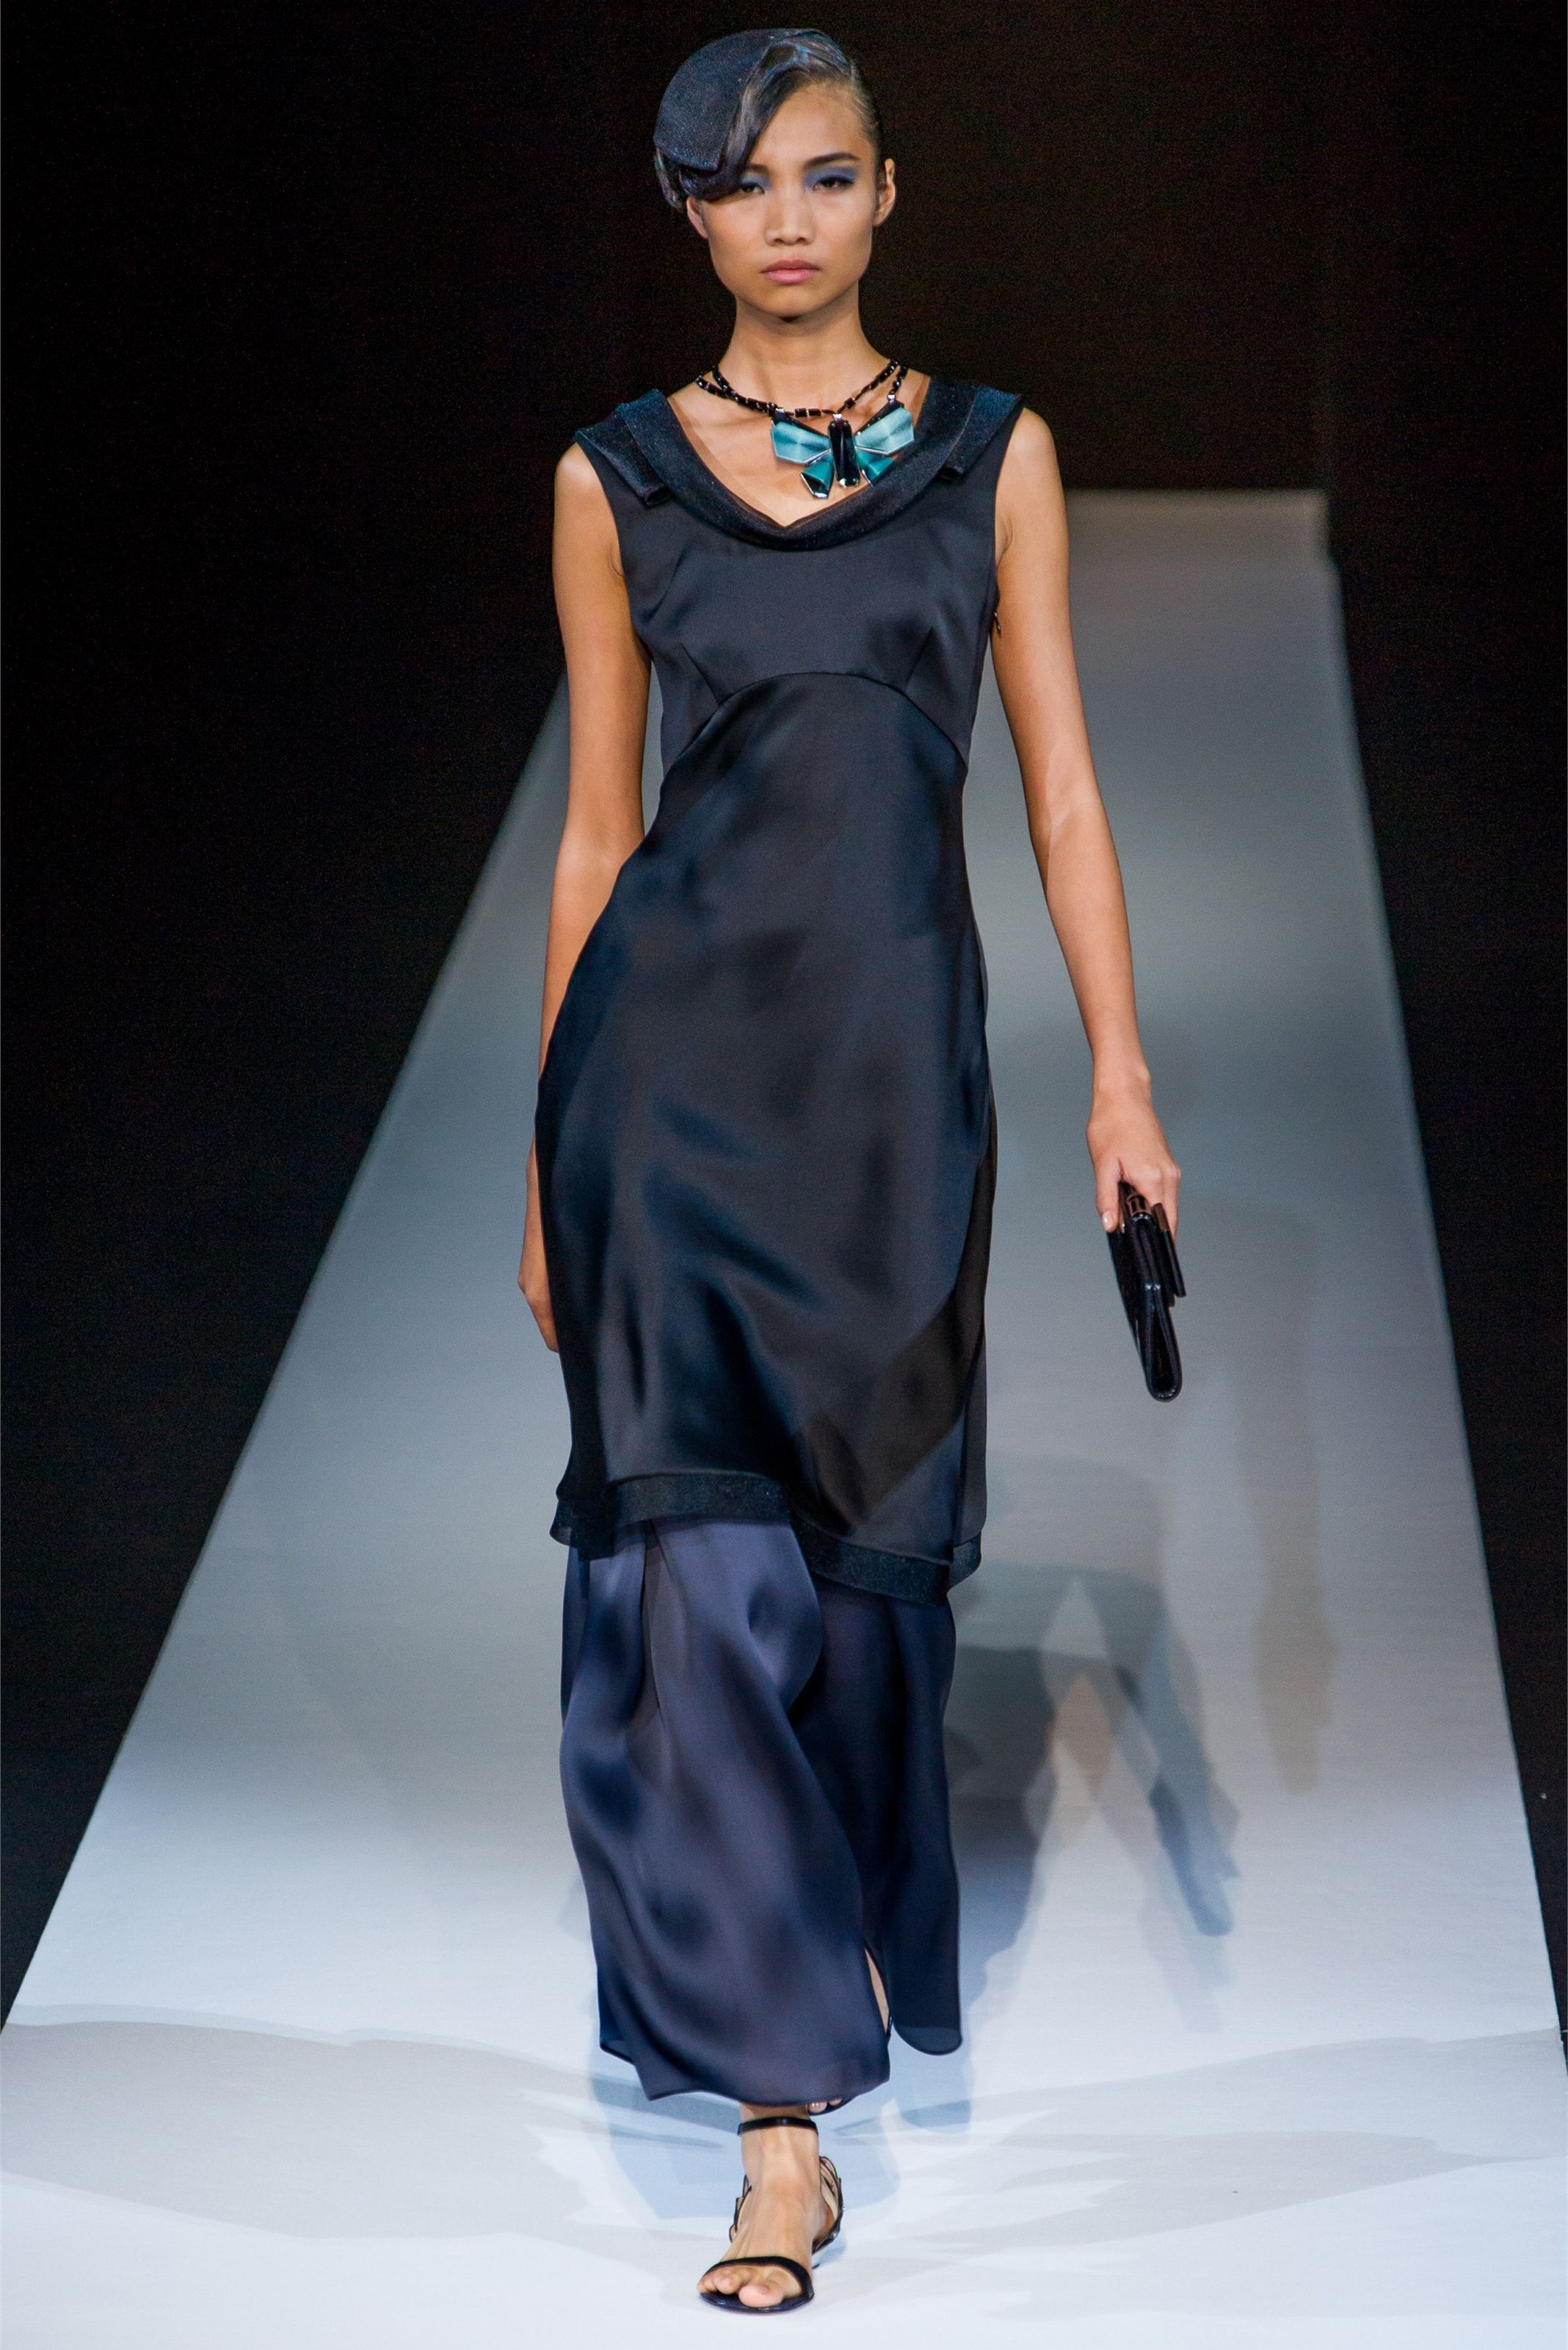 Abiti Eleganti 2018 Armani.Pin Su Rich Lush Sensual Satin Leather Velvet Brocade Silks